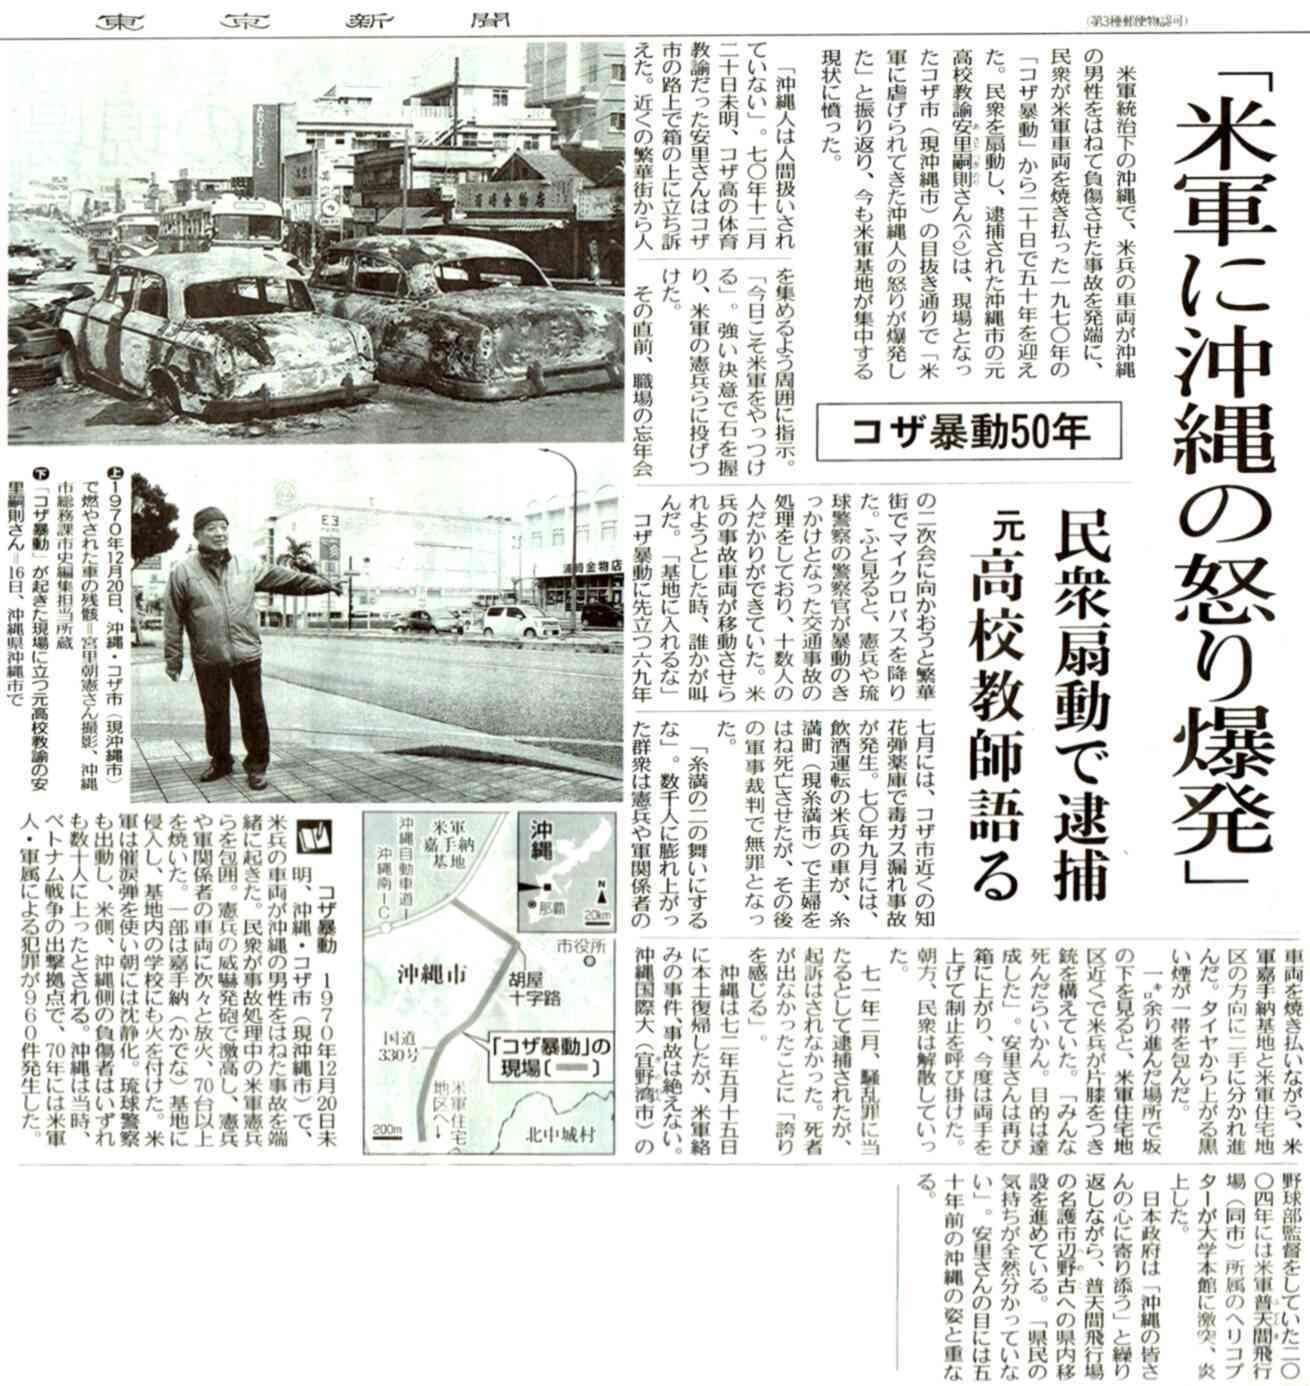 tokyo2020 12211